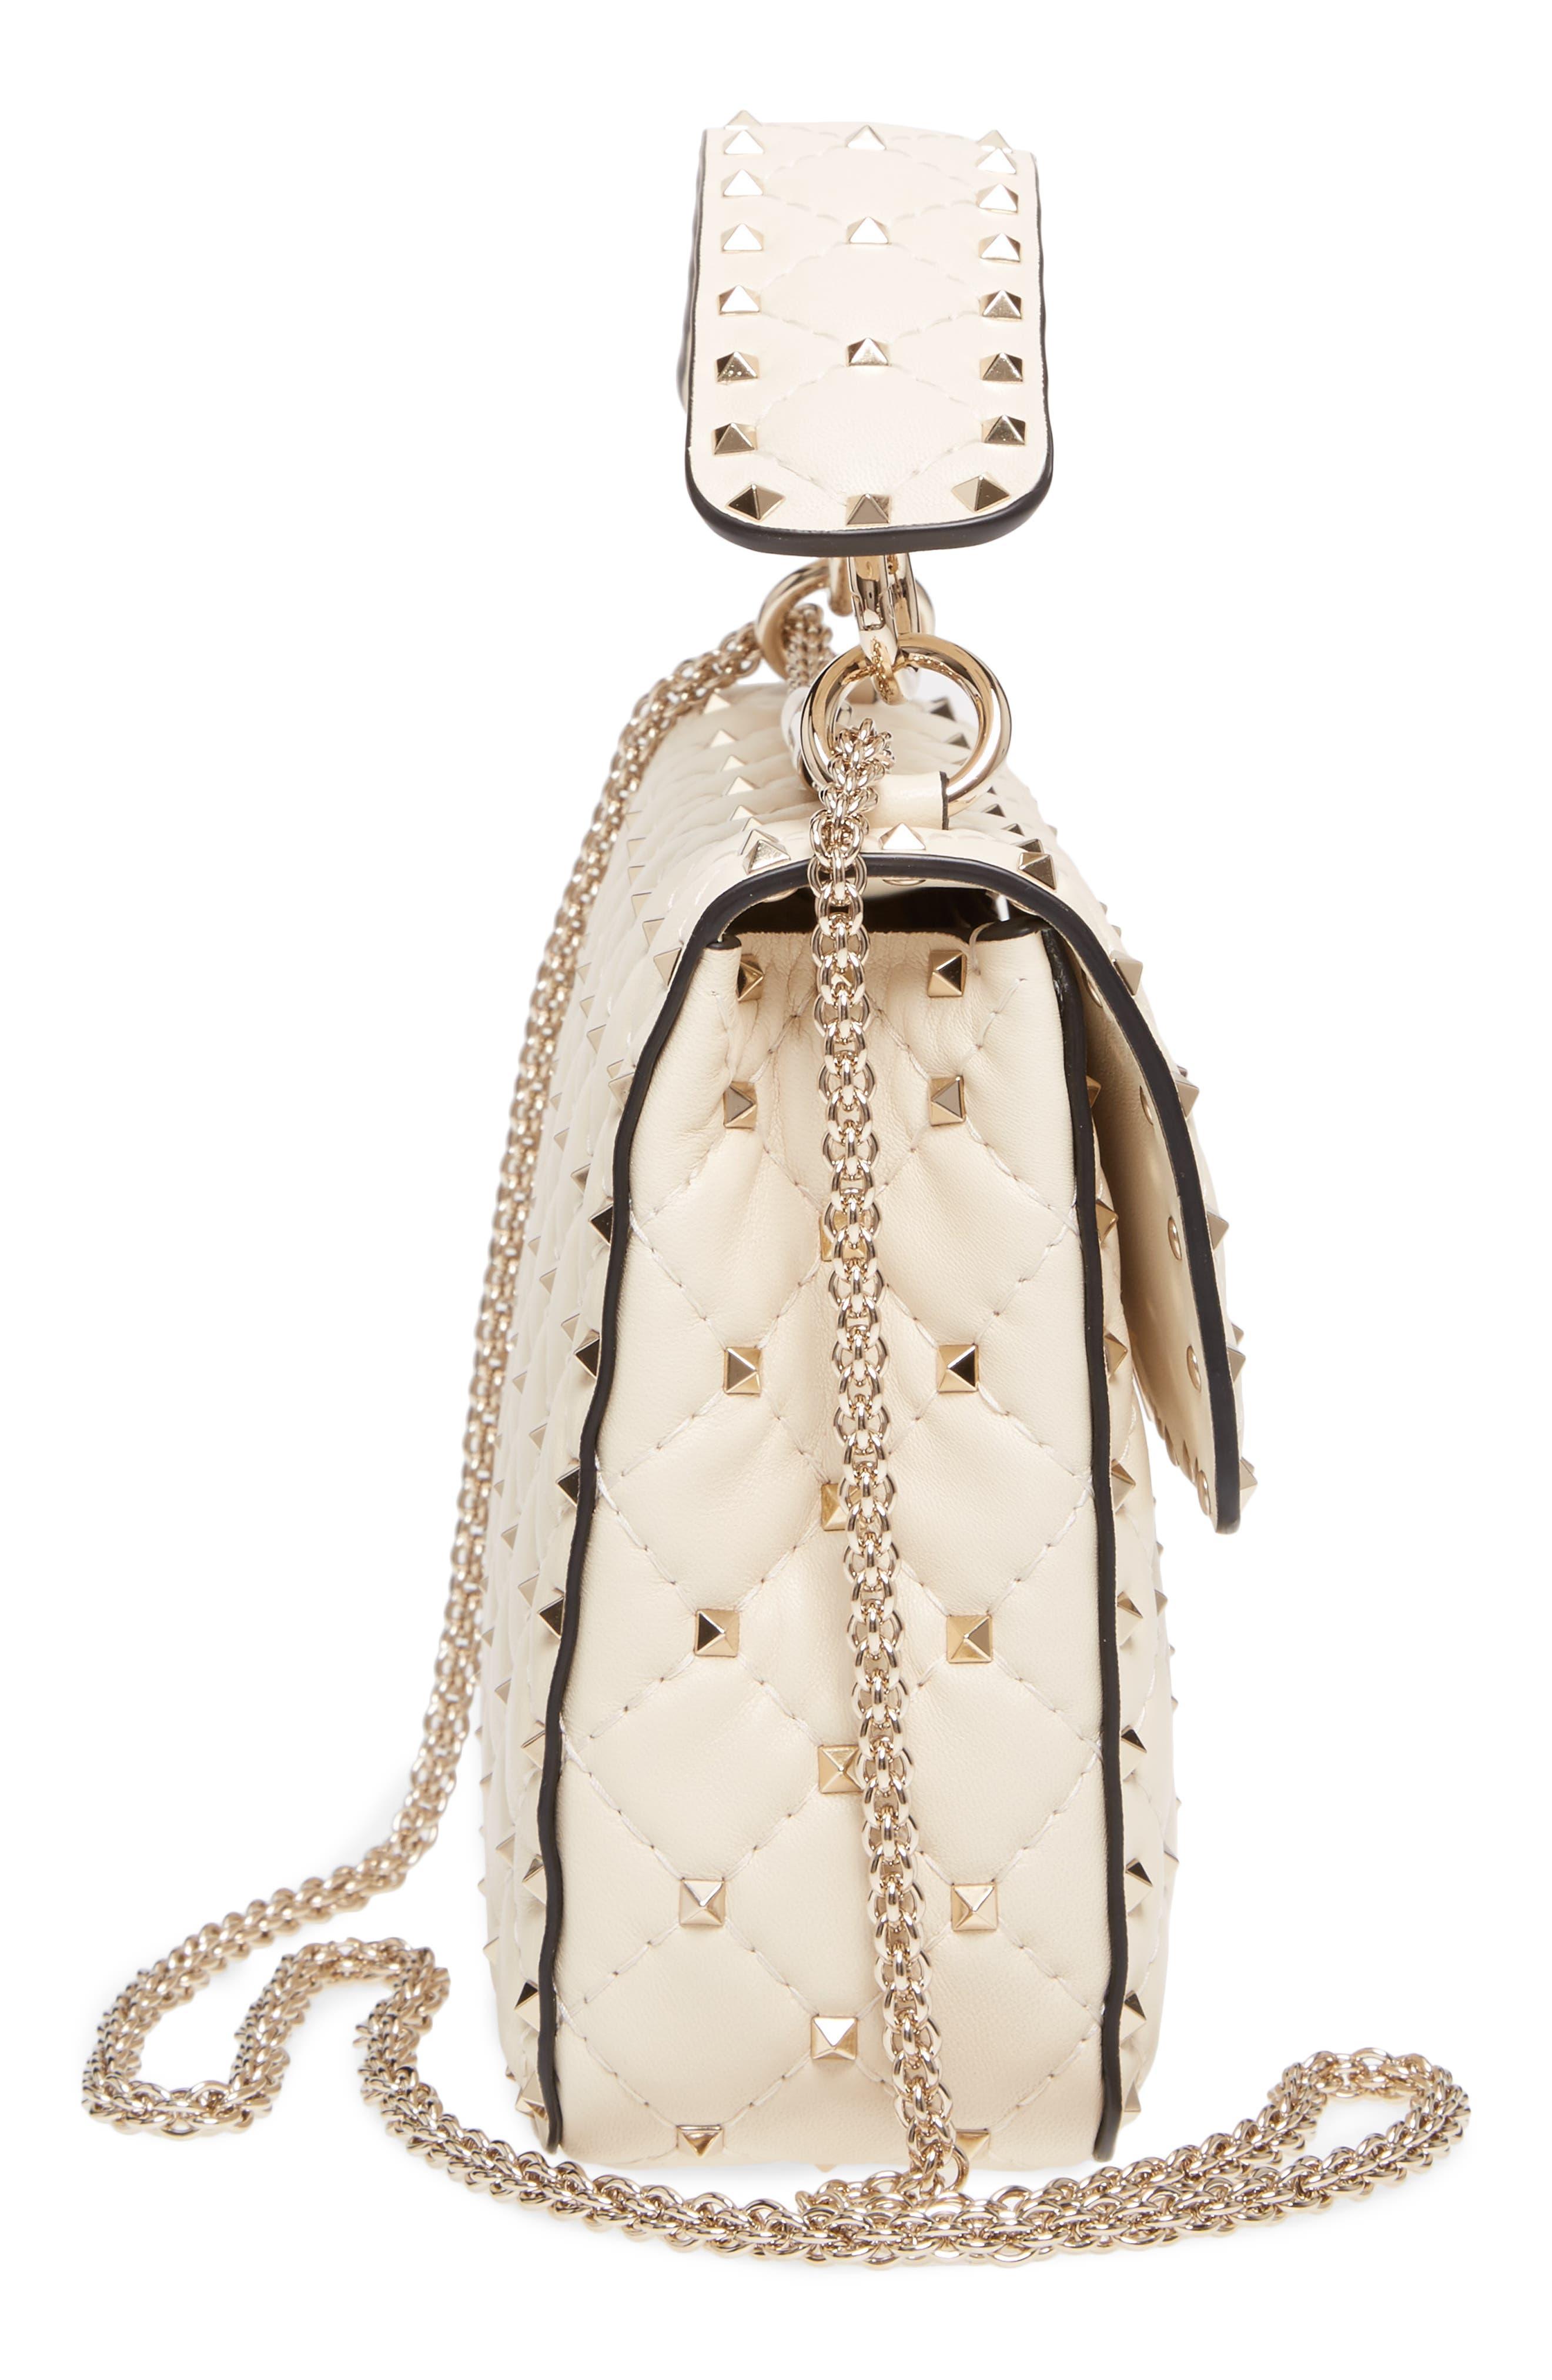 Medium Rockstud Matelassé Quilted Leather Shoulder Bag,                             Alternate thumbnail 5, color,                             Ivory